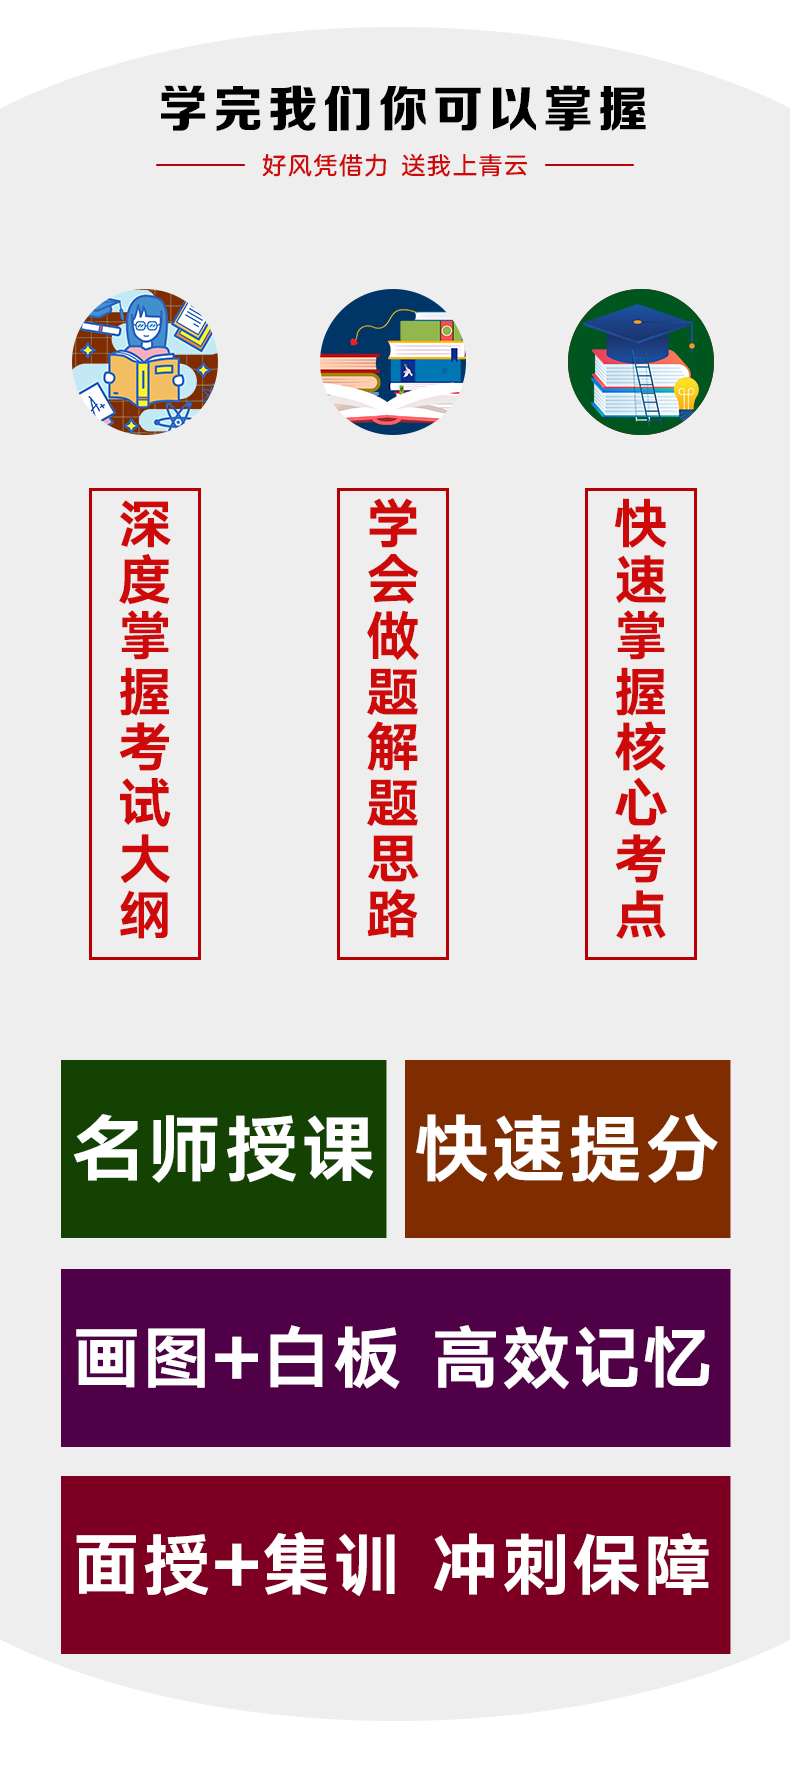 images-网络全程班_02